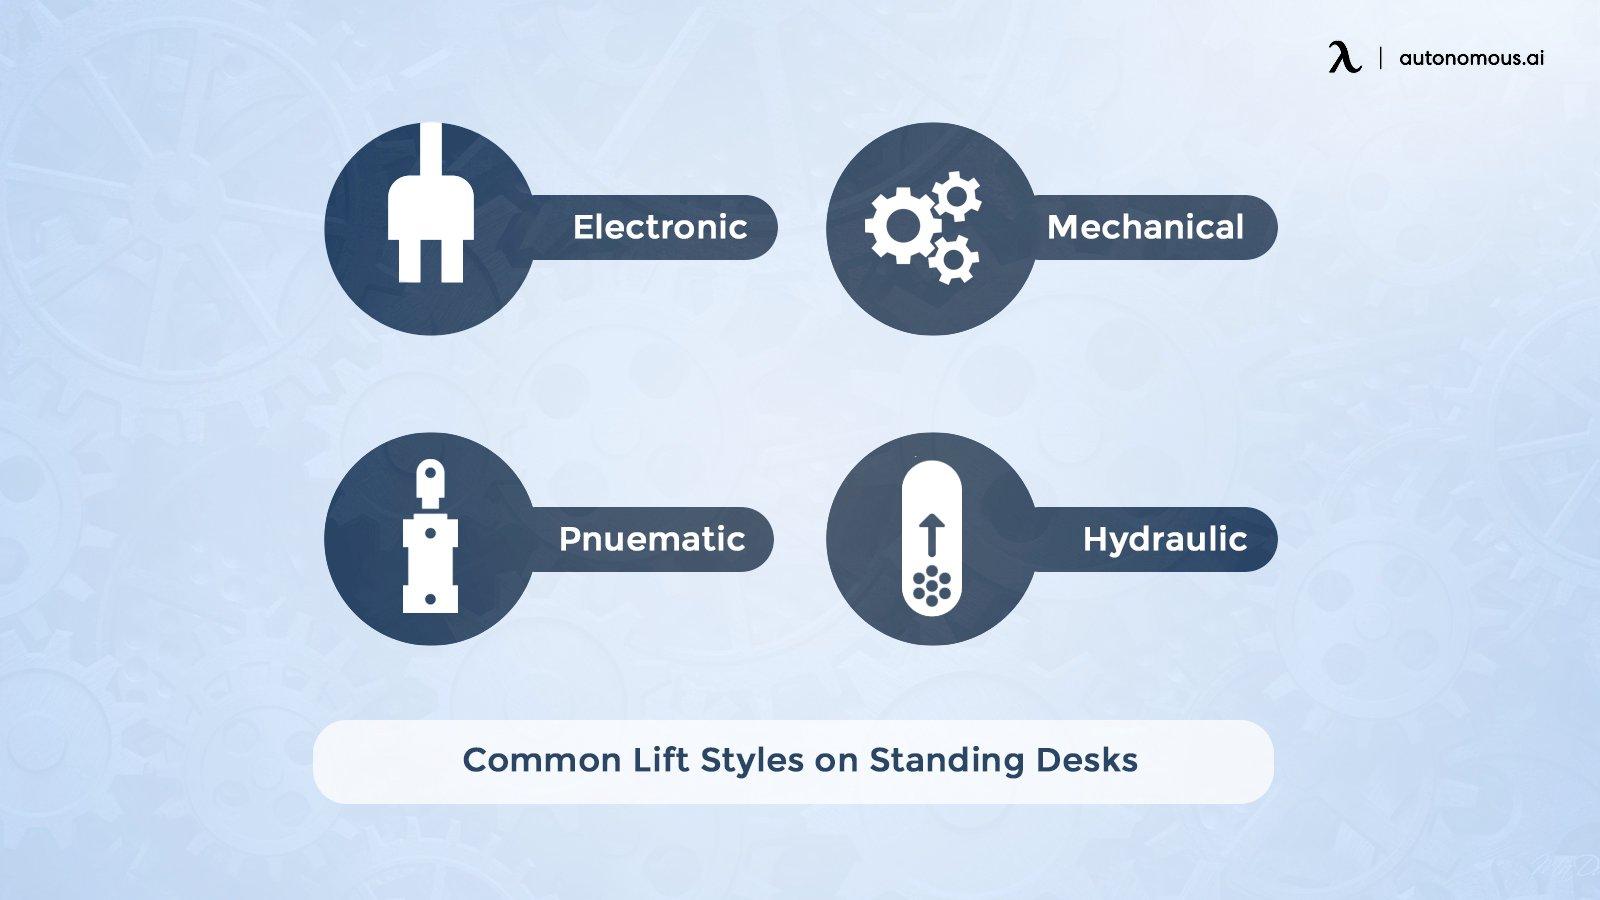 Lift styles on standing desks